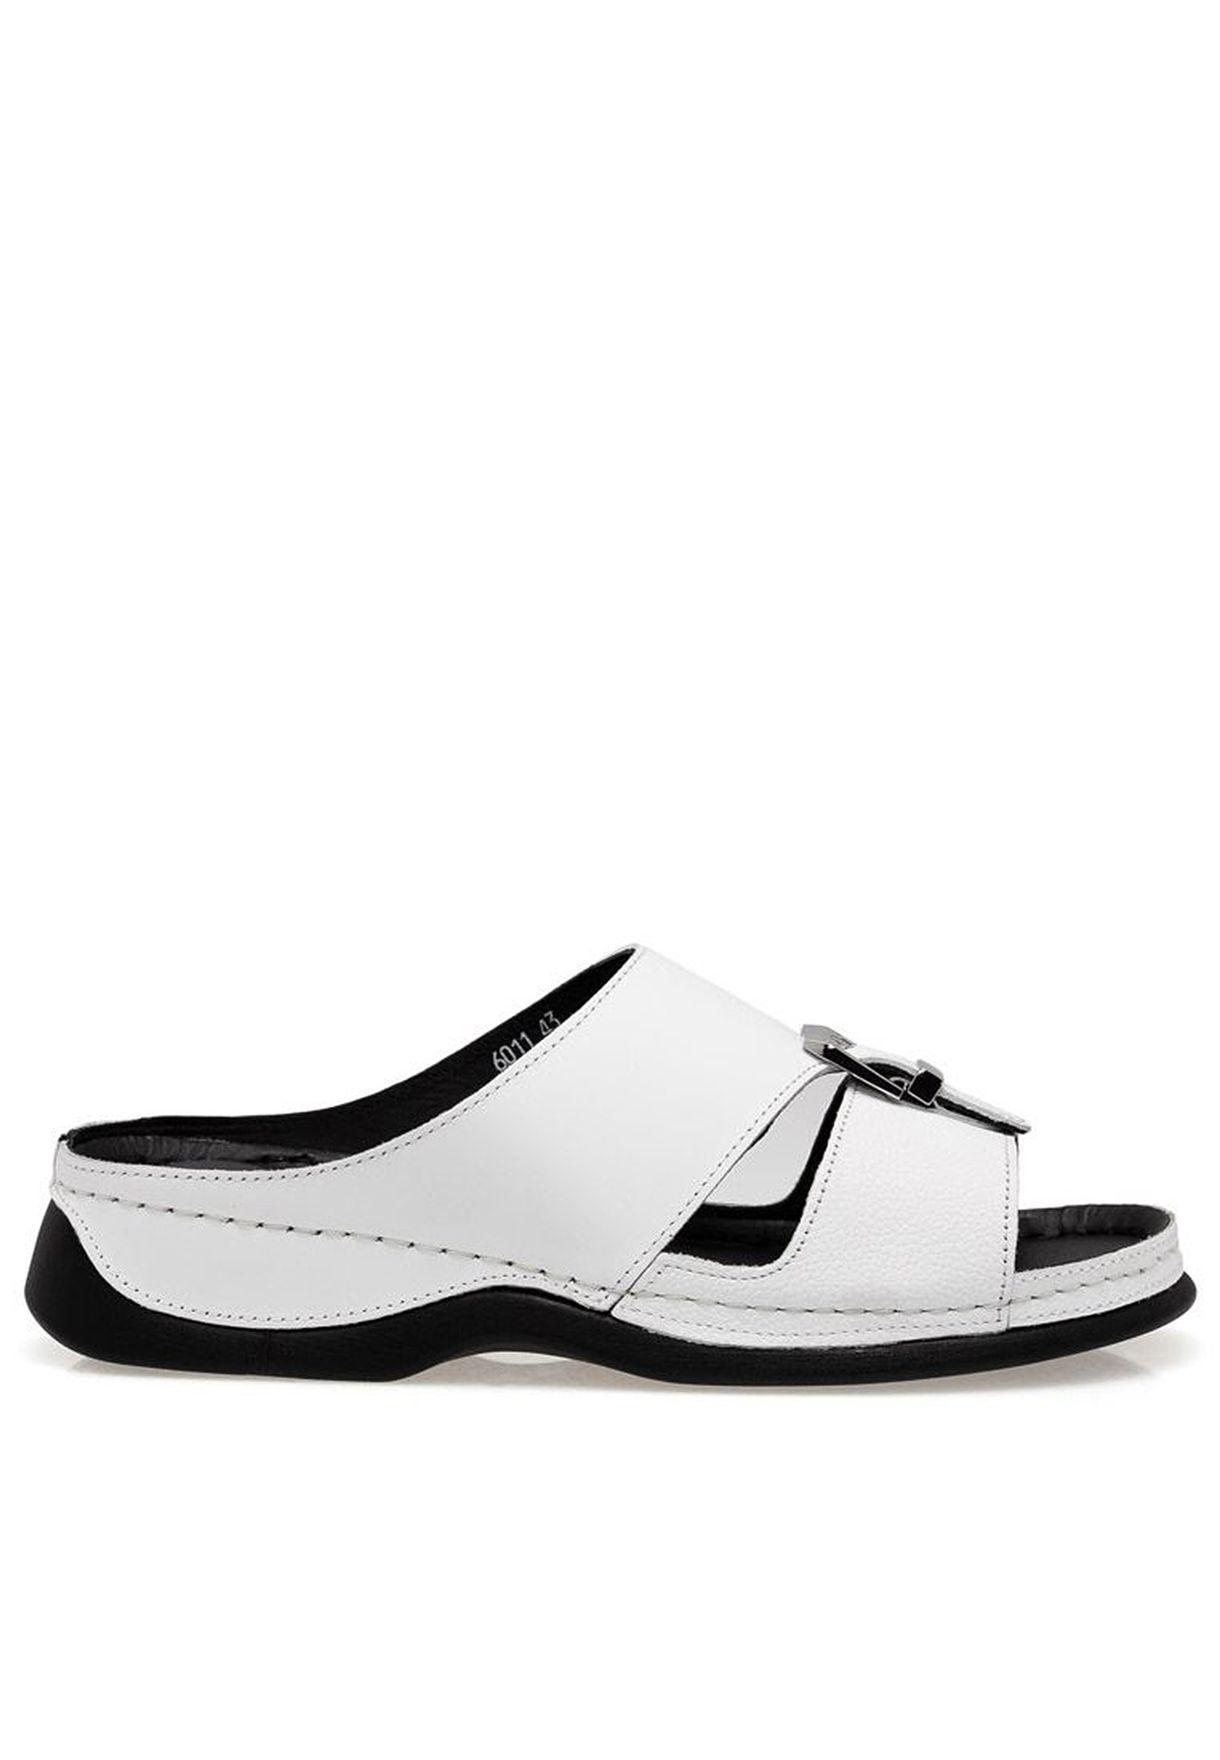 comfortable white dress sandals